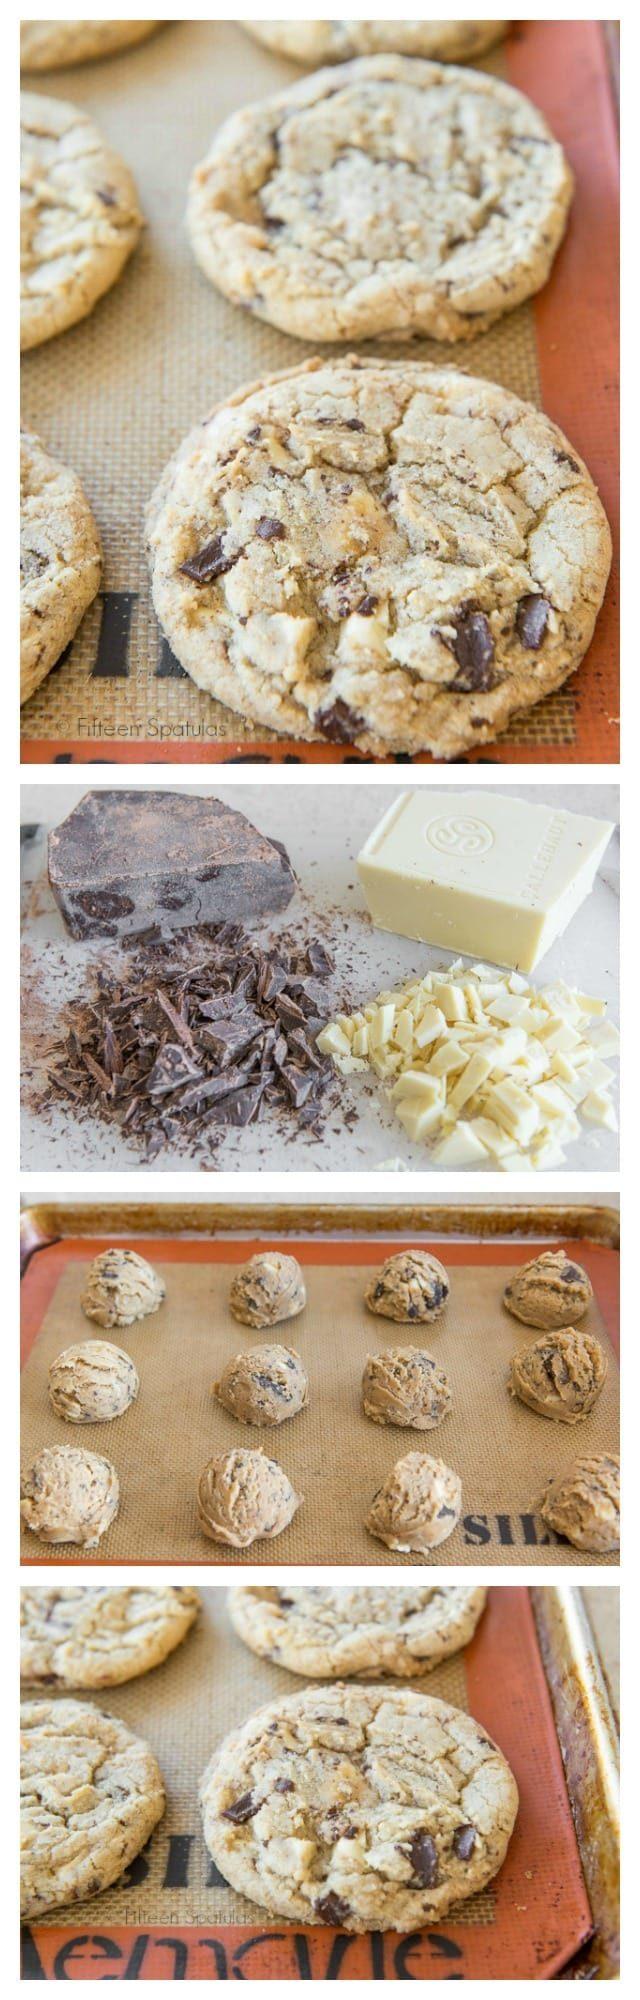 Chocolate Chunk Cookies with White and Dark Chocolate Chunks!